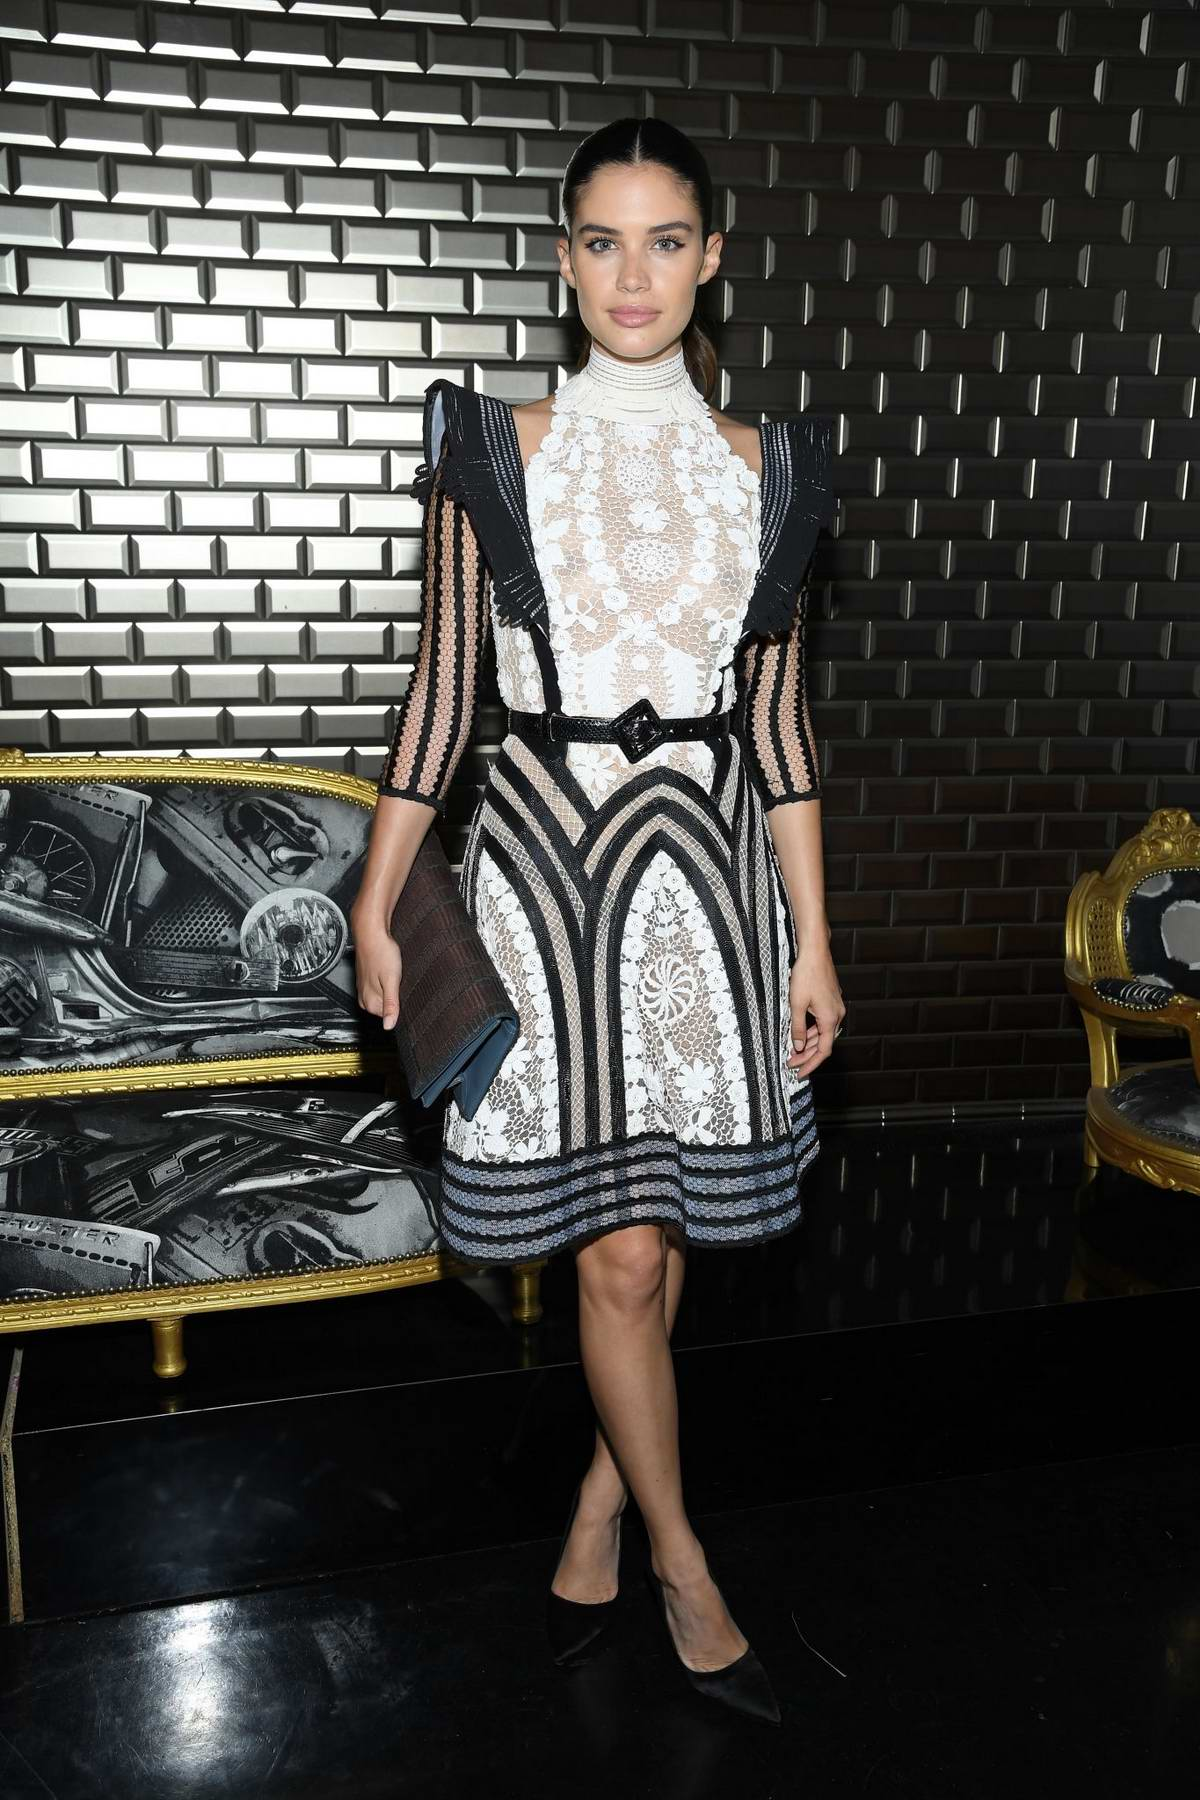 Sara Sampaio attends the Jean Paul Gaultier Haute Couture Fall/Winter 2019/20 show during Paris Fashion Week in Paris, France